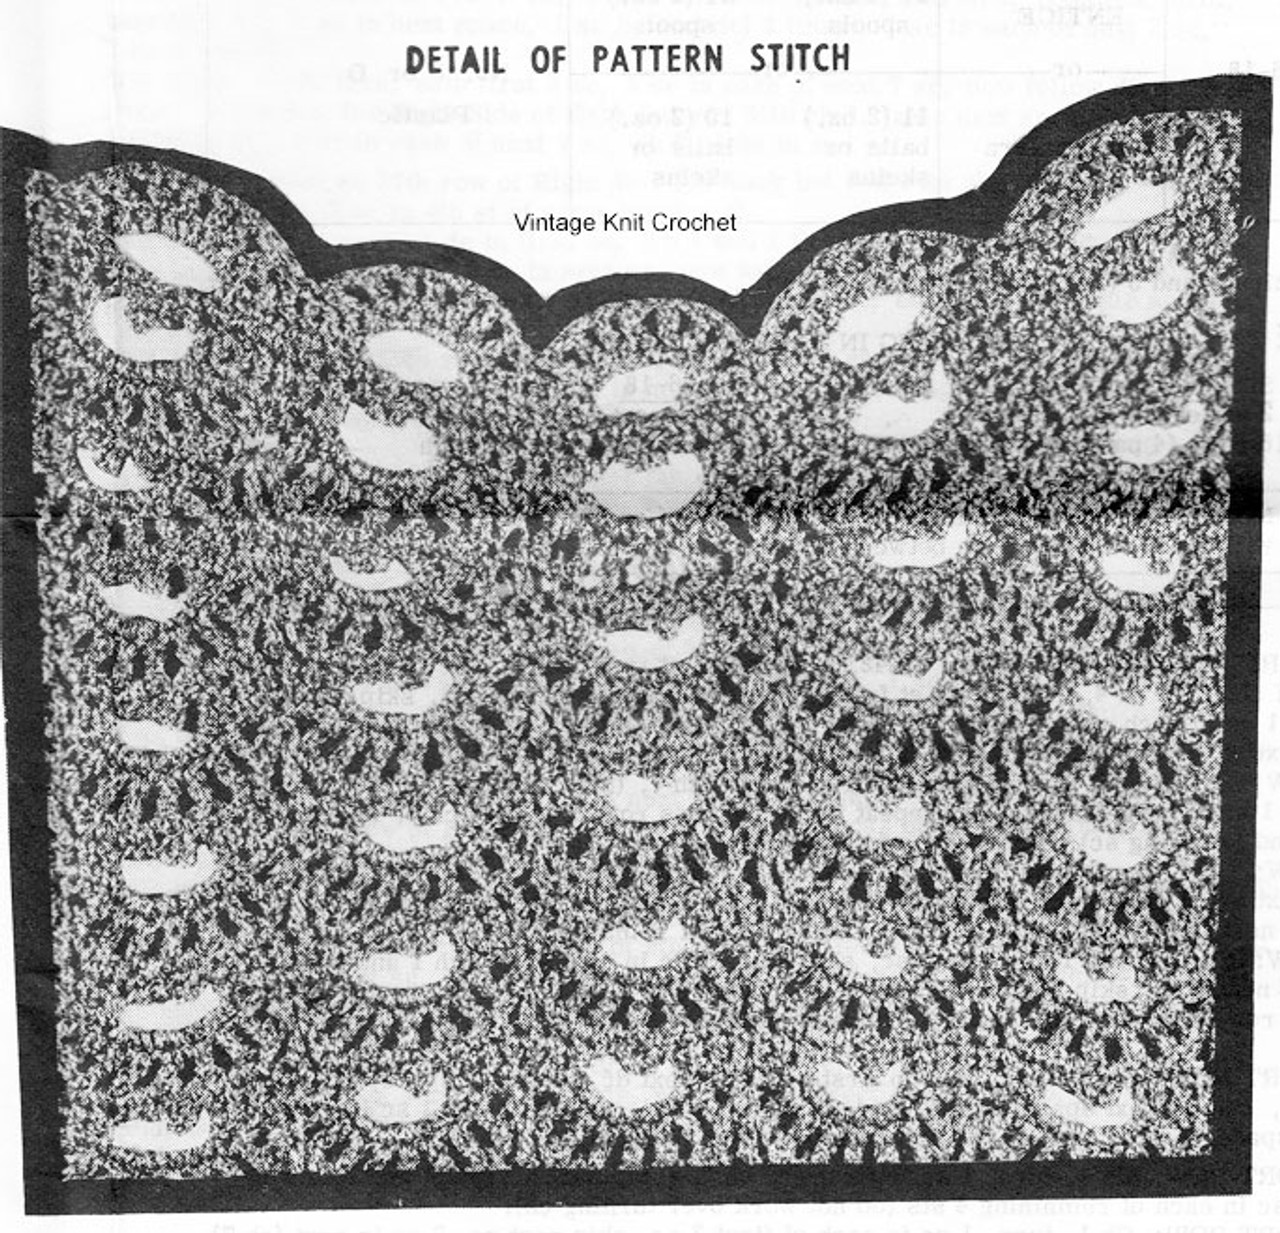 Shell Stitch Pullover Pattern Illustration, Design 7373